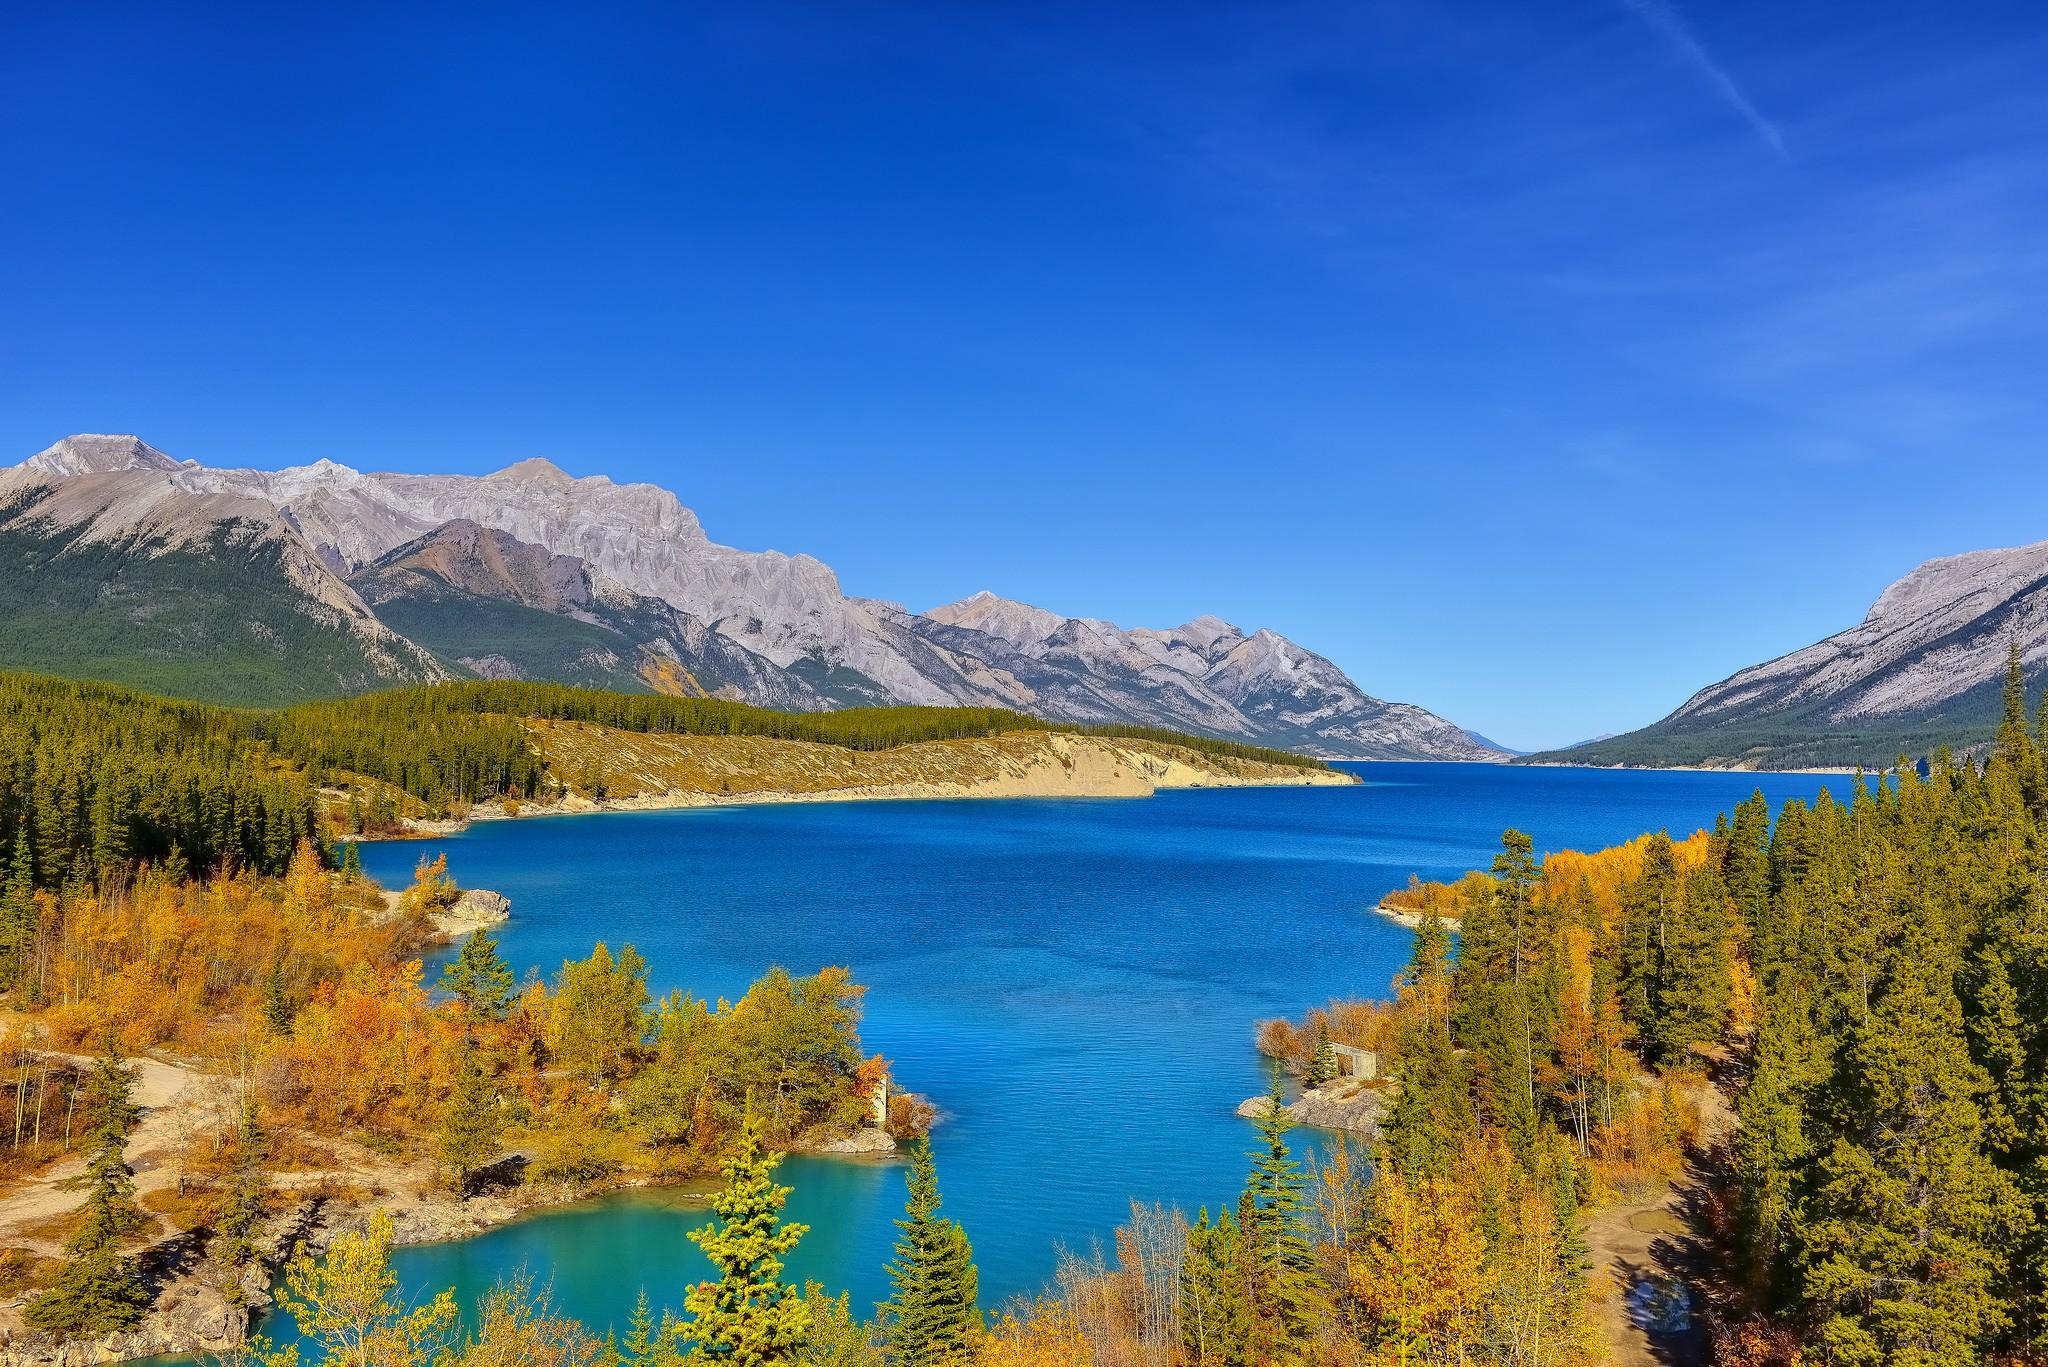 General 2048x1367 landscape lake mountains Alberta fall